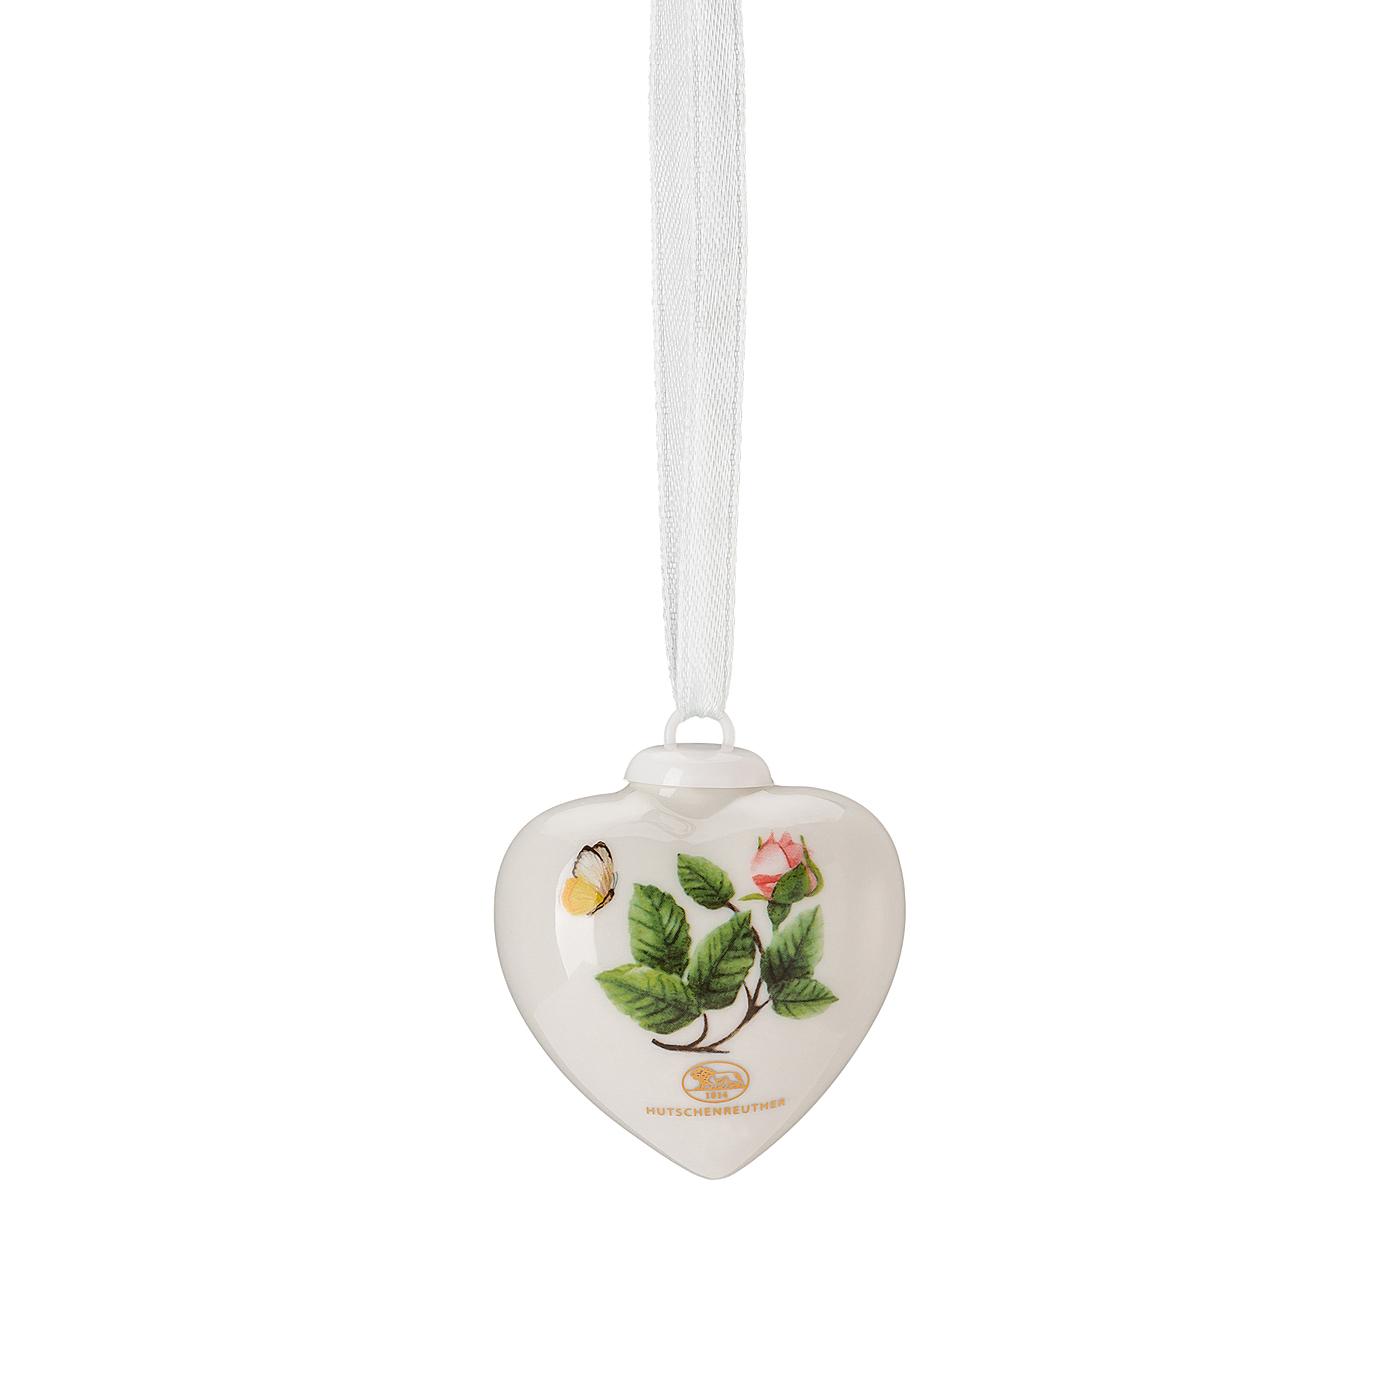 Porzellan-Mini-Herz Frühlingsgrüsse Heckenrose - rosé Hutschenreuther